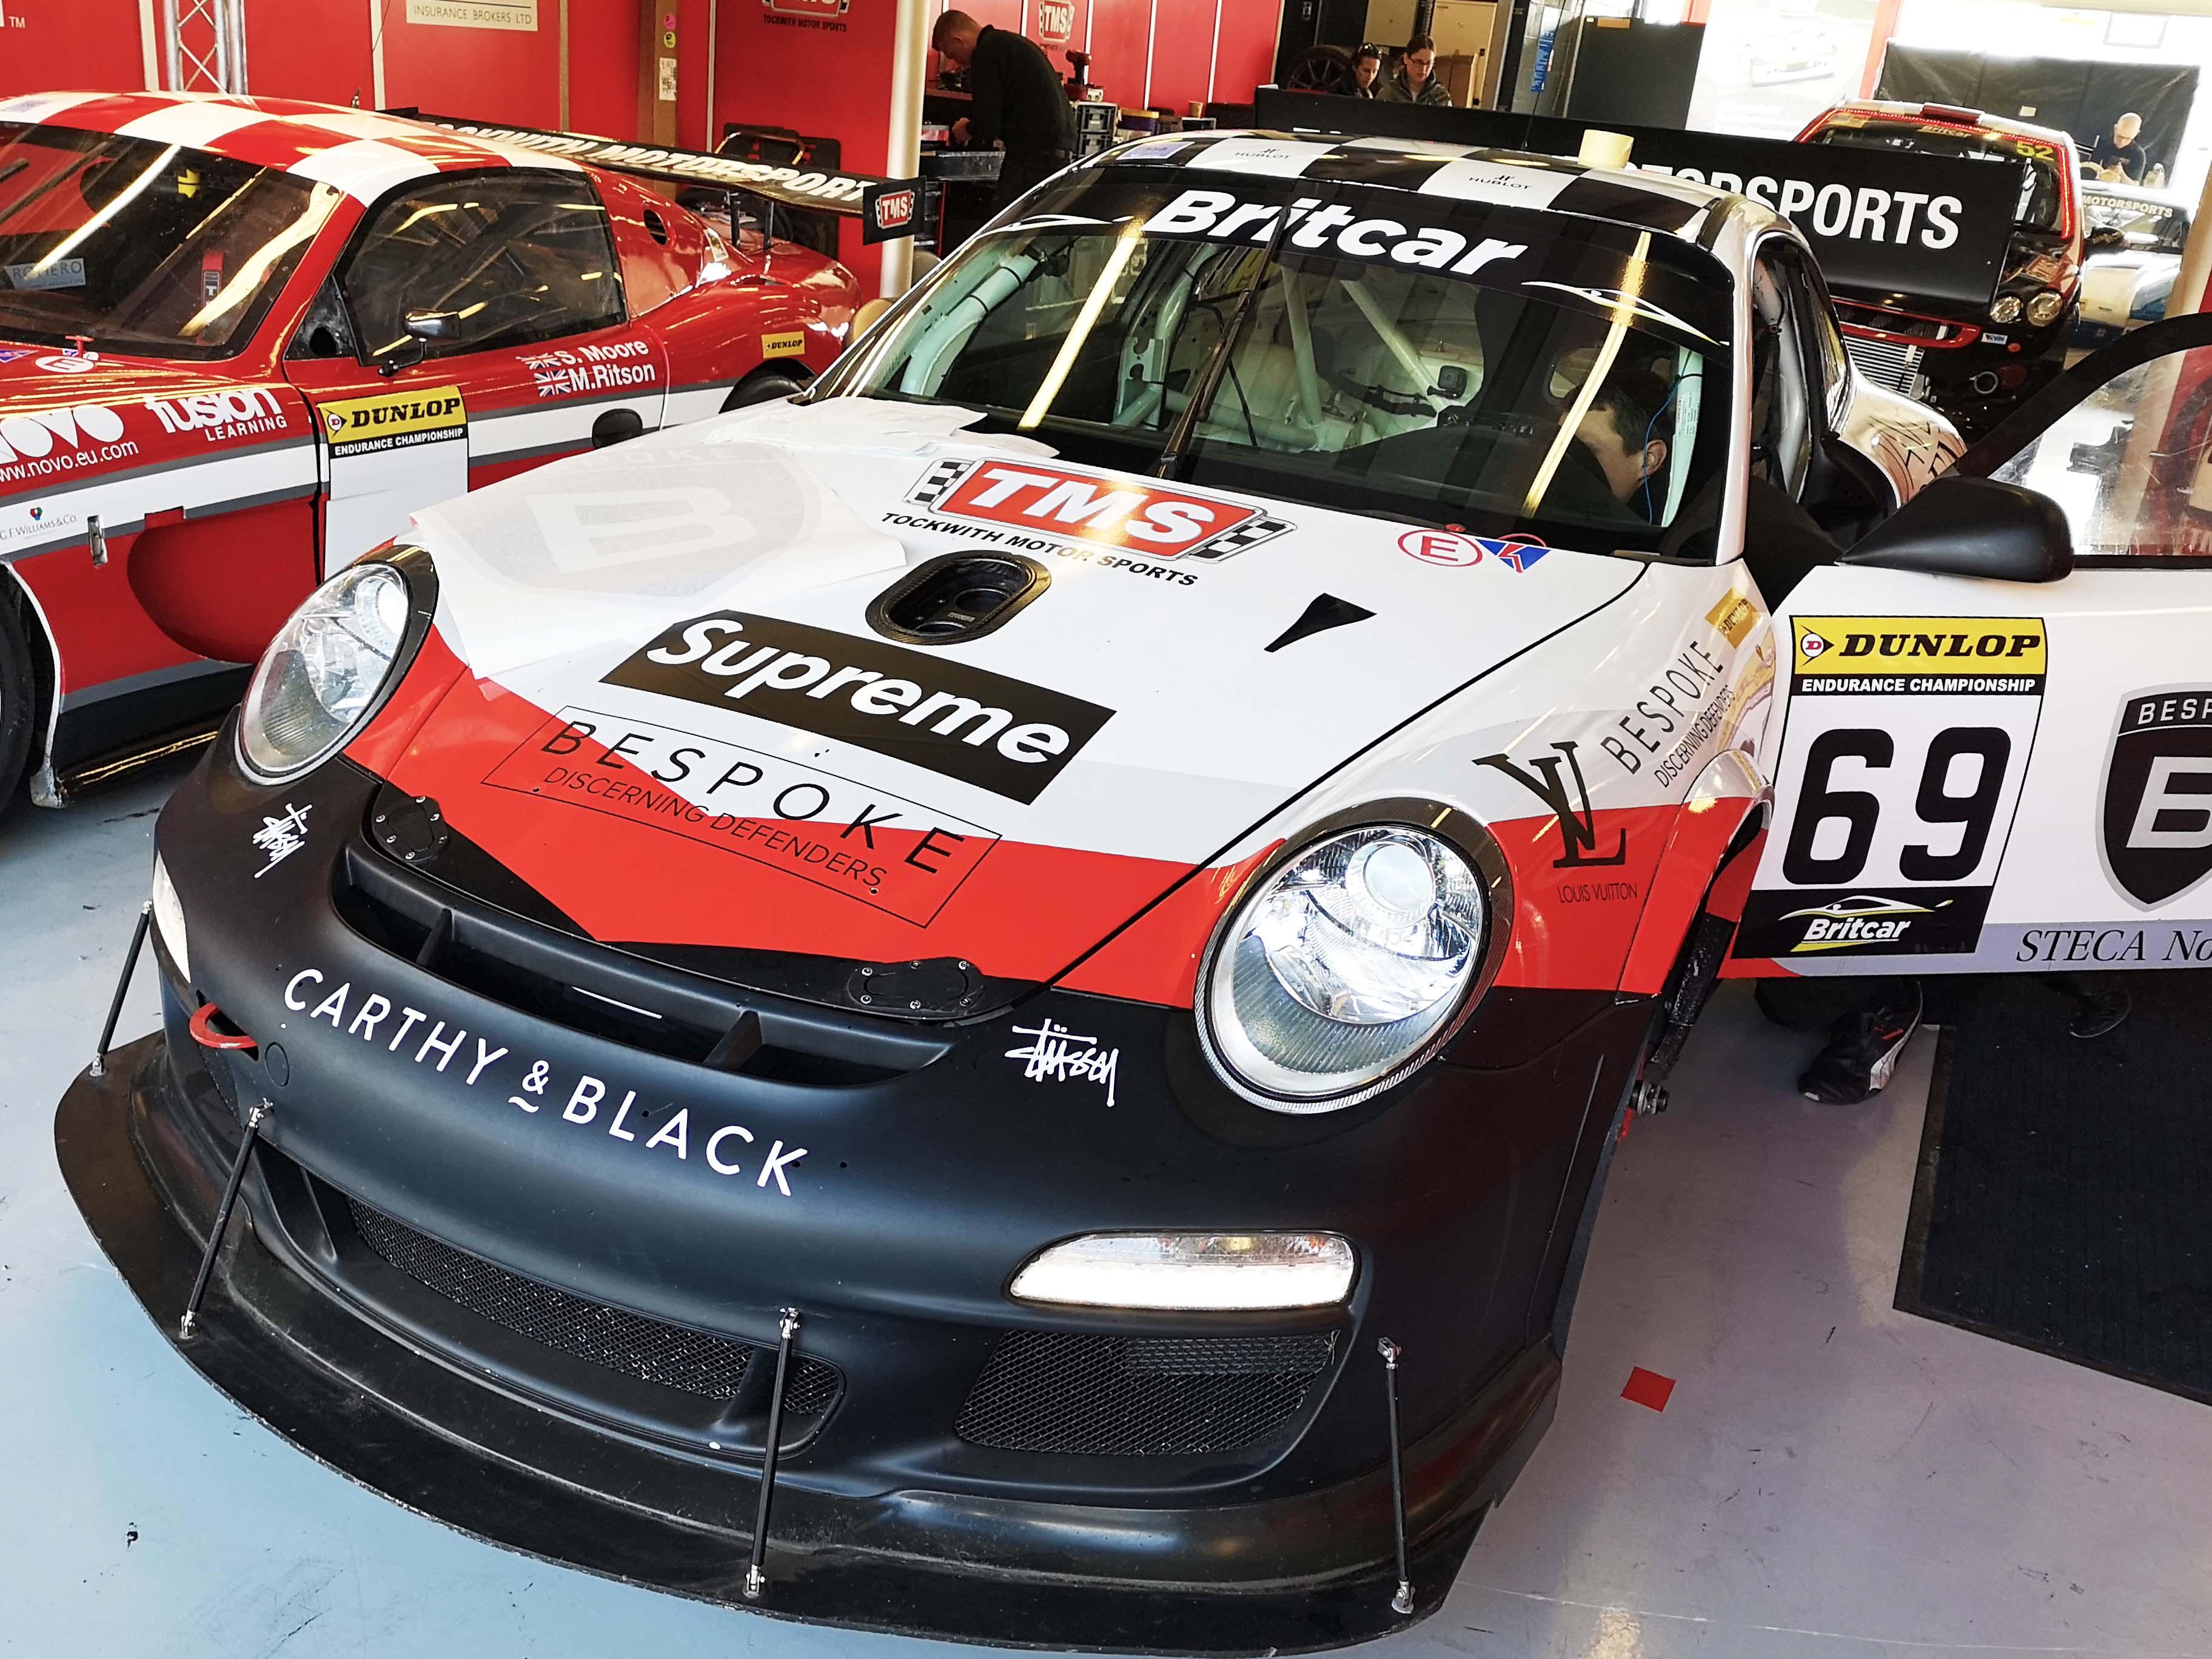 Porsche Graphics installed at Silverstone Britcar Cup